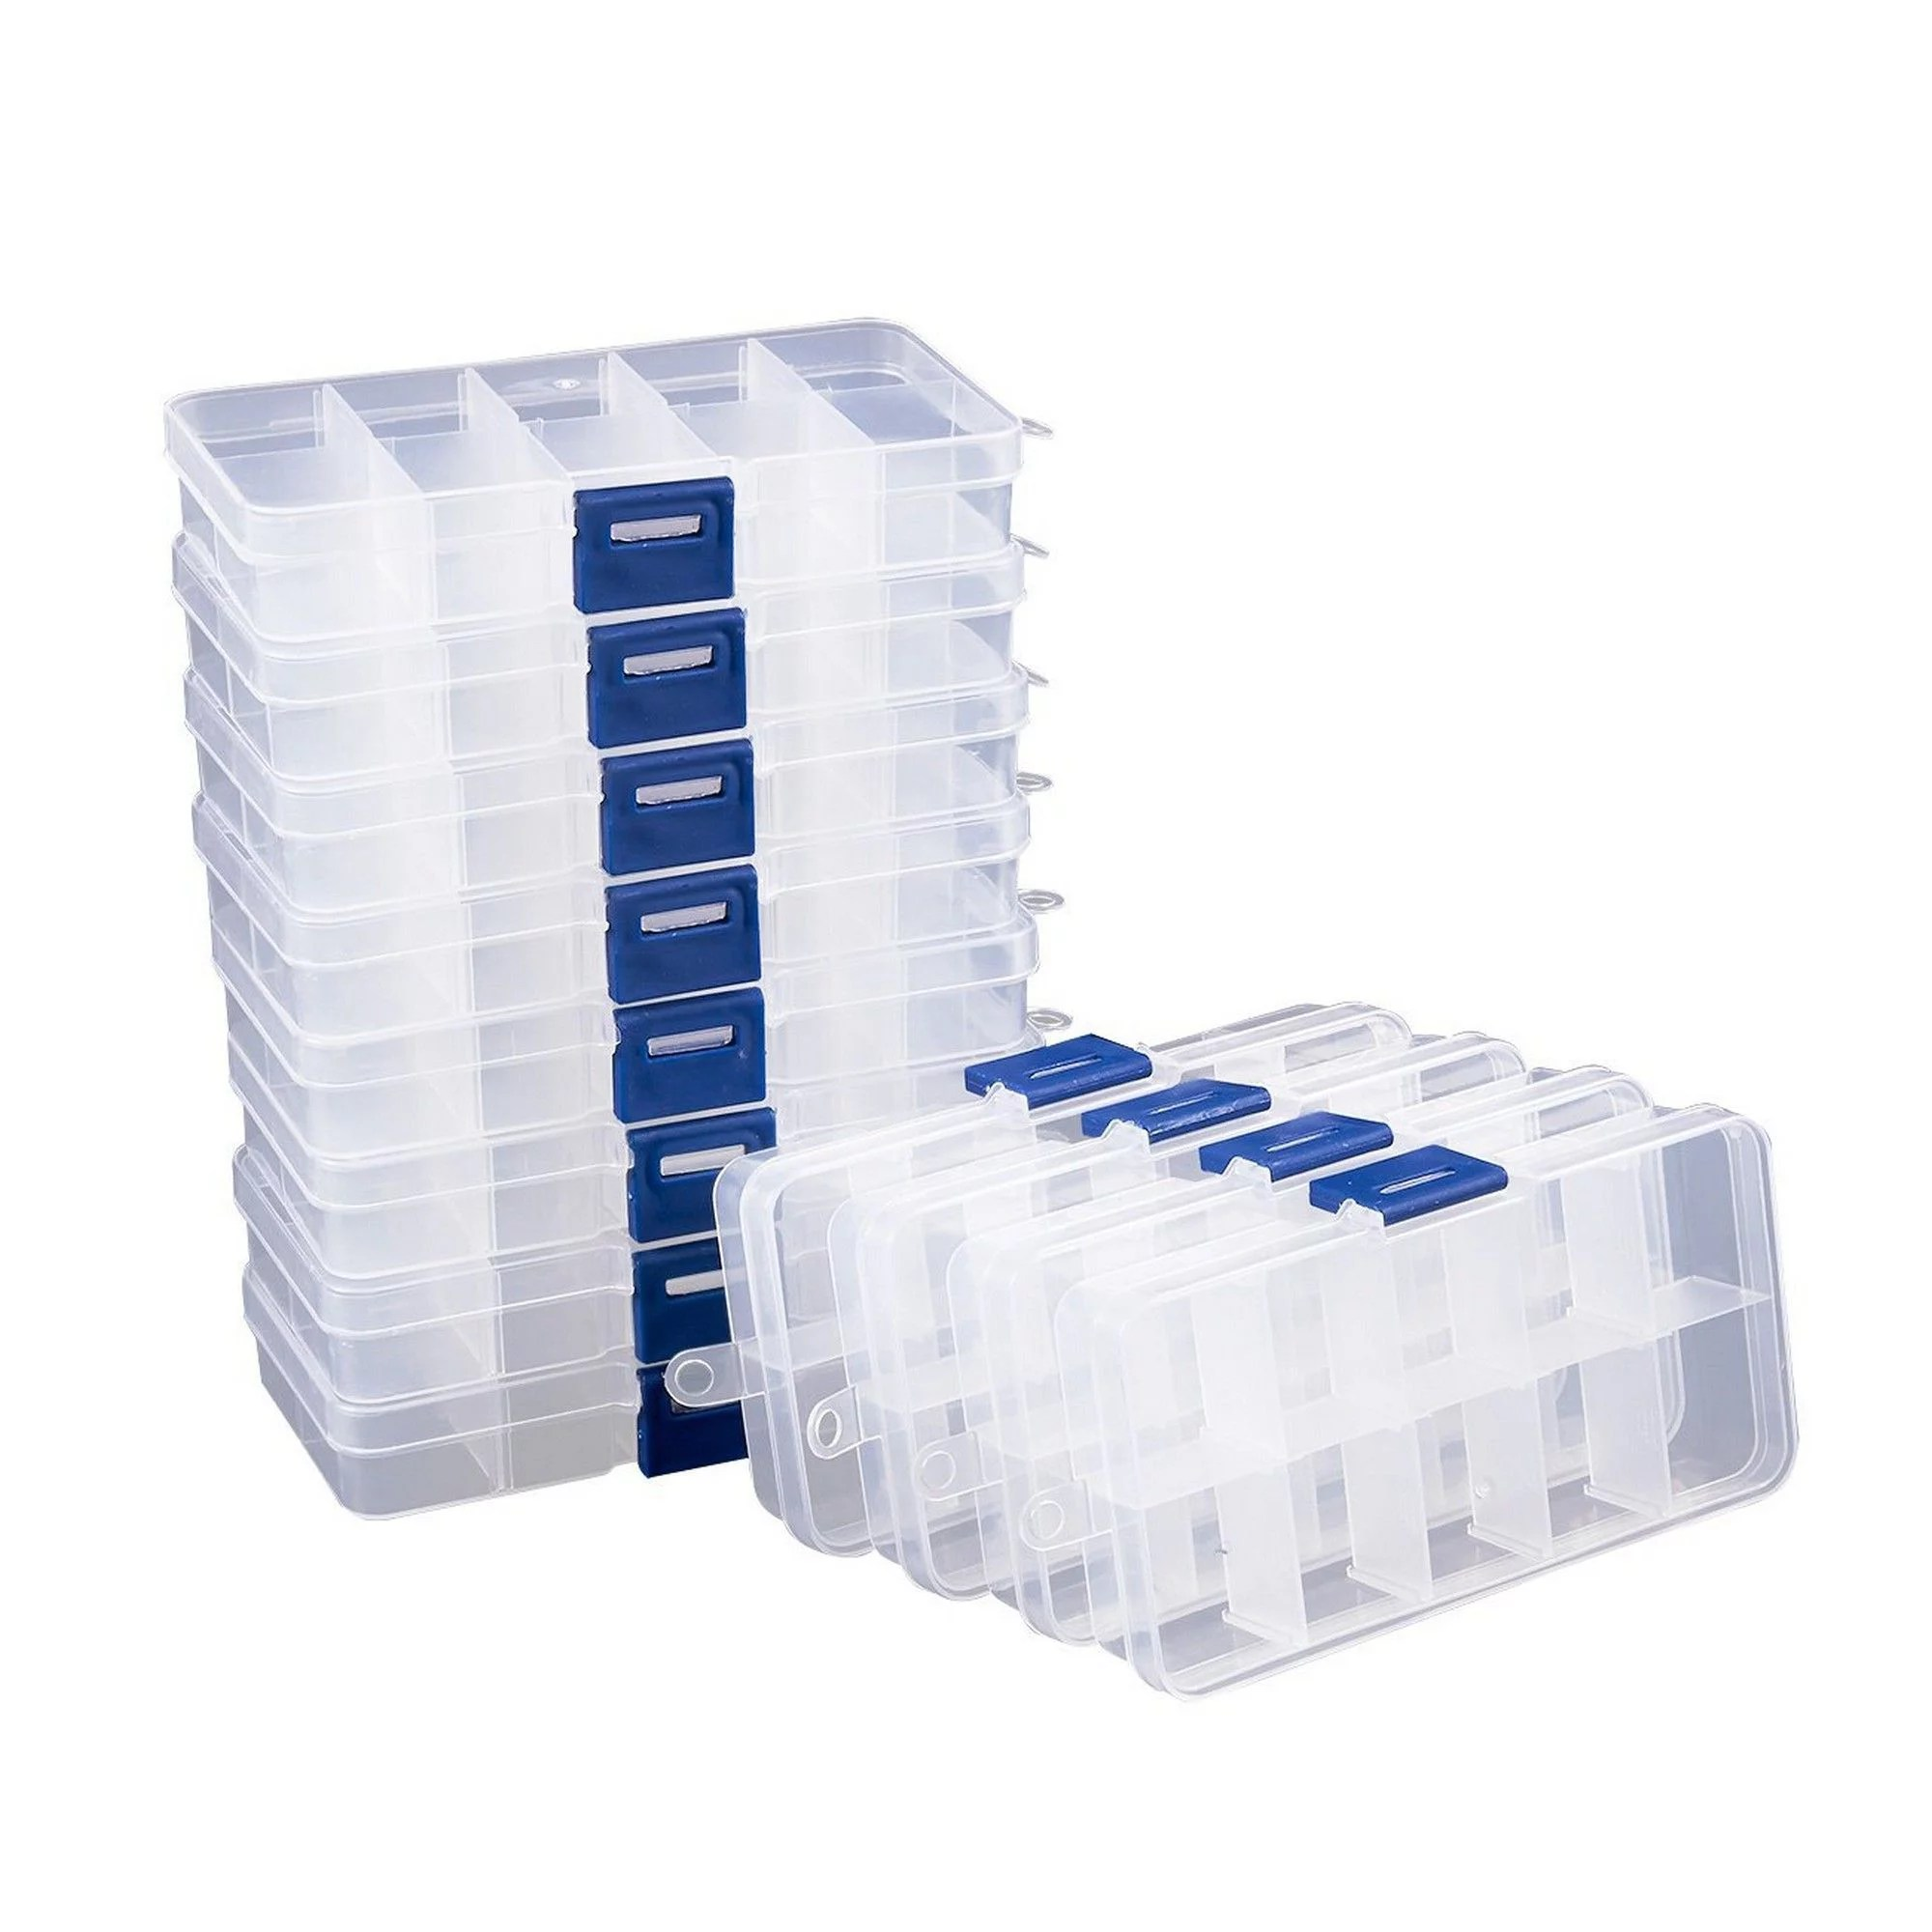 Plastic Jewellery Box : plastic, jewellery, Jewelry, Boxes, Organizers, Clear, Walmart.com